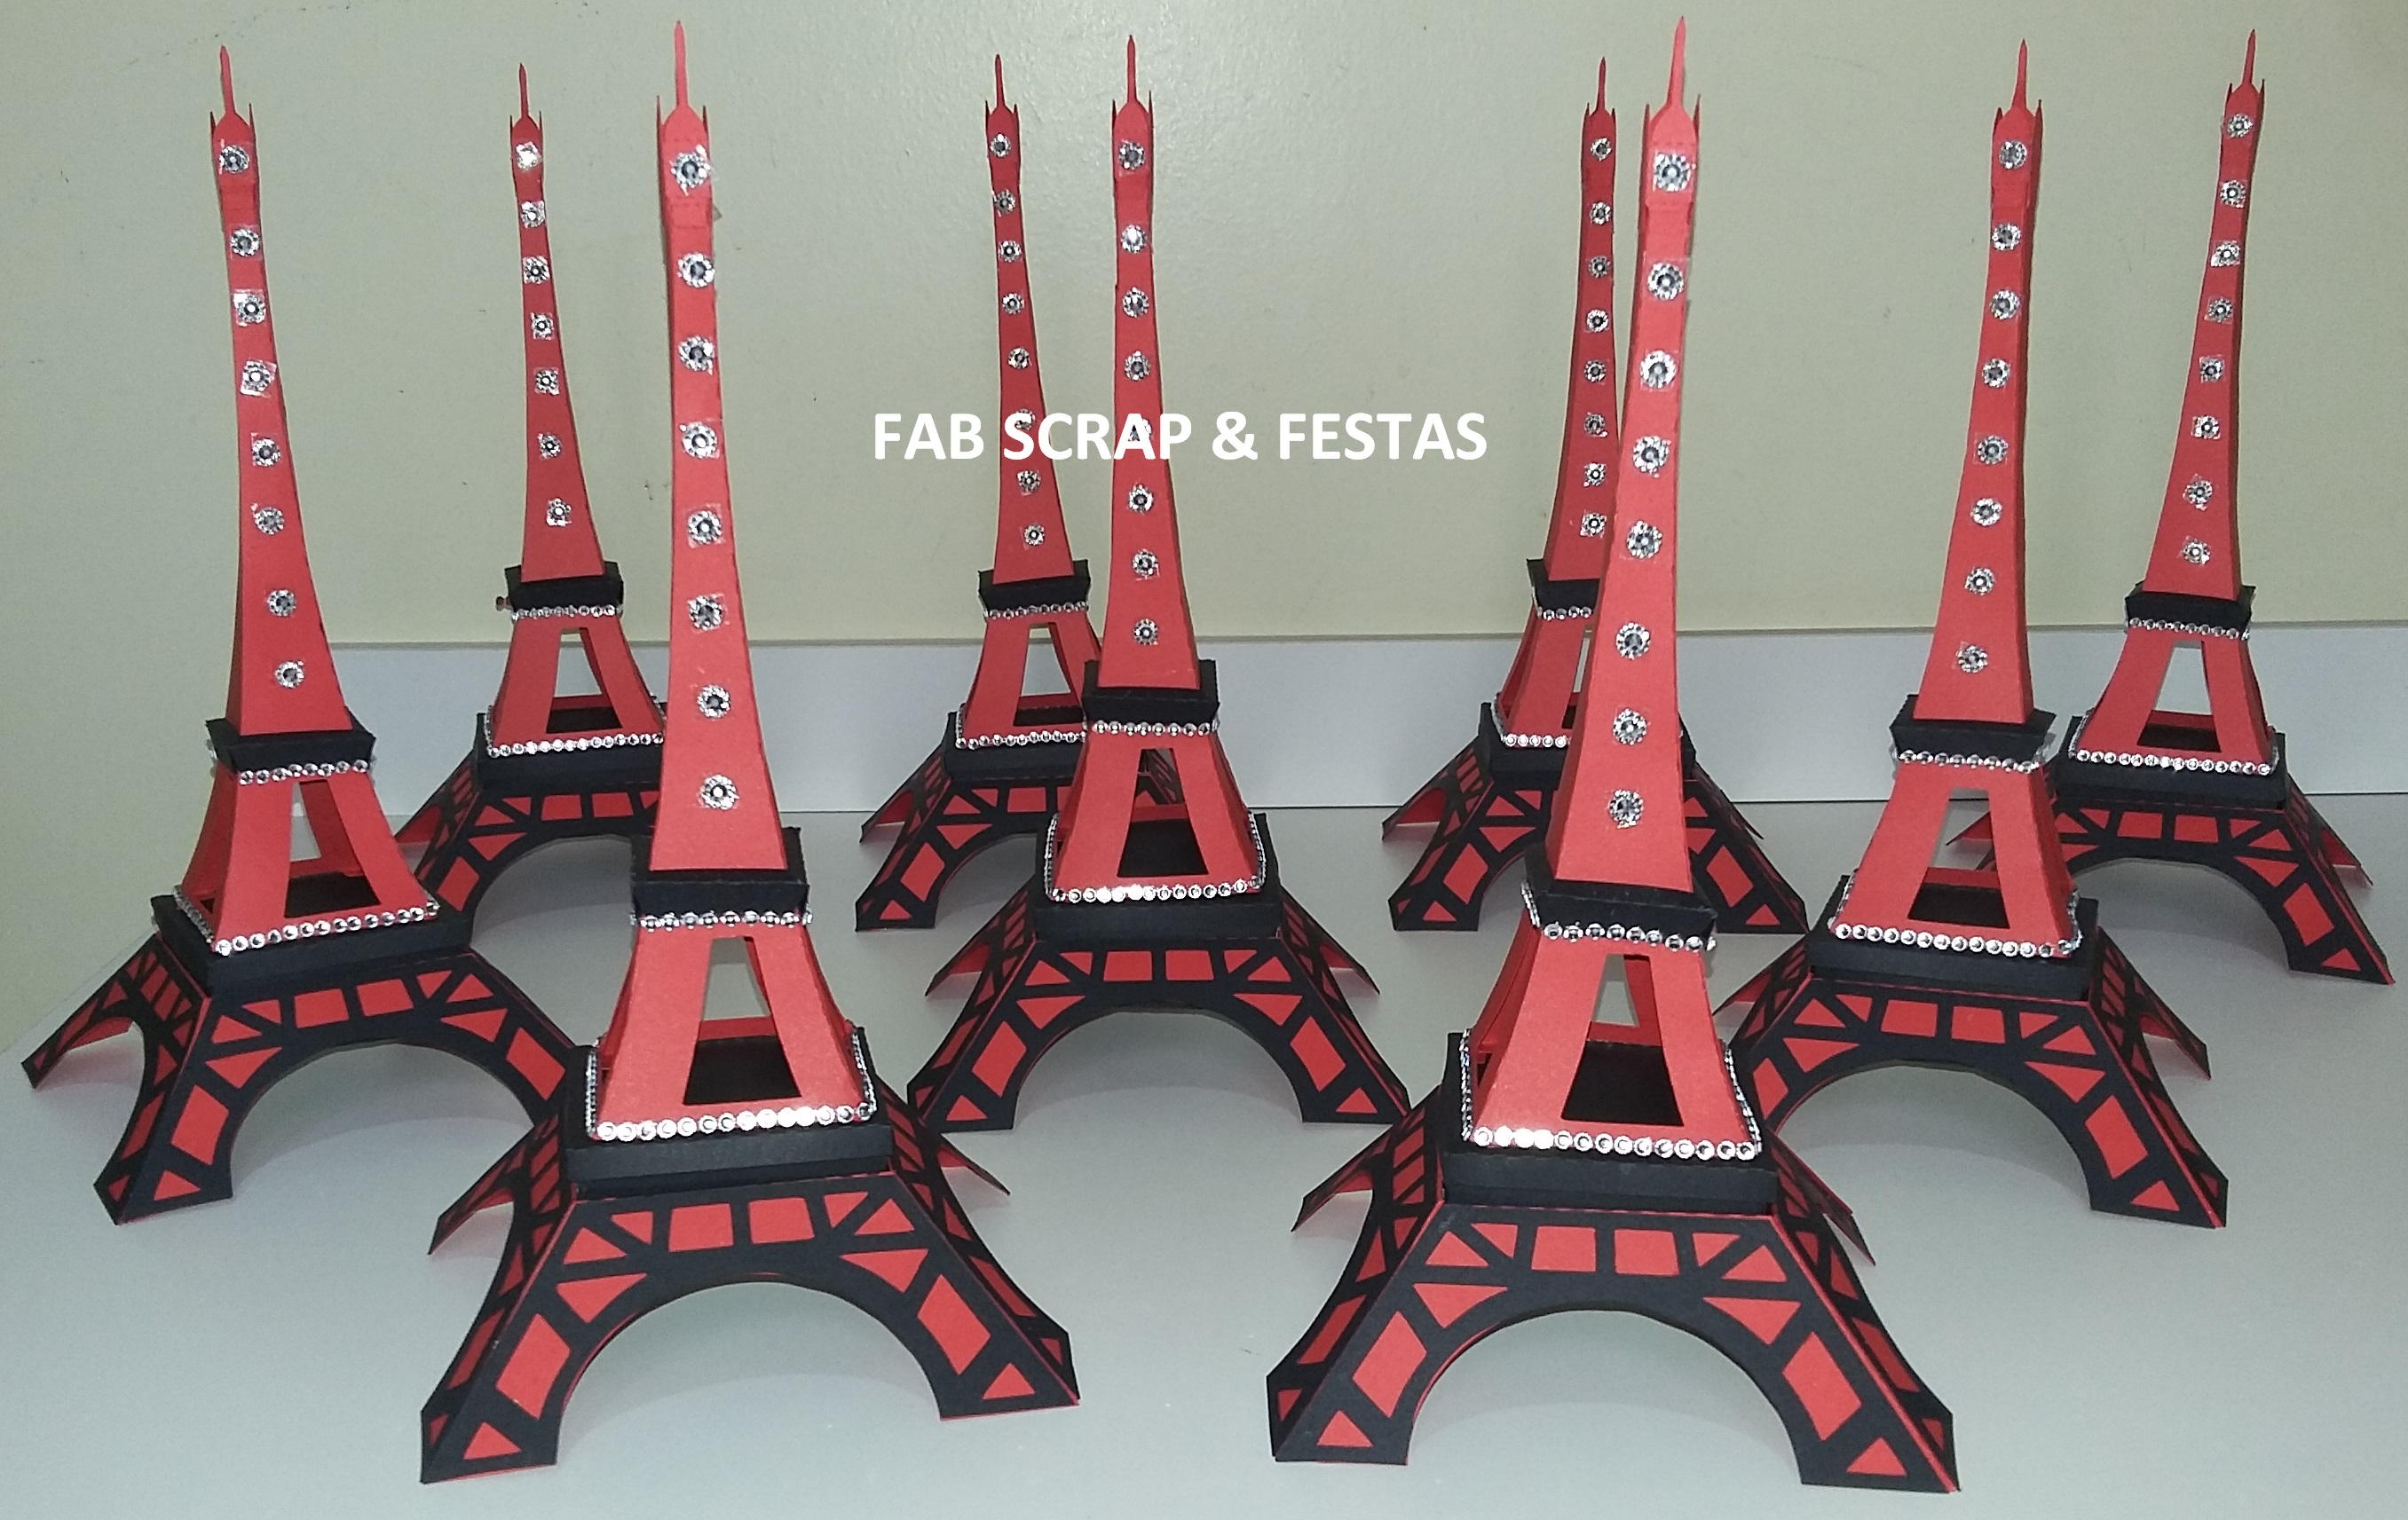 Torre Eiffel Scrap 3d Grande 29cm No Elo7 Fab Scrap Festas